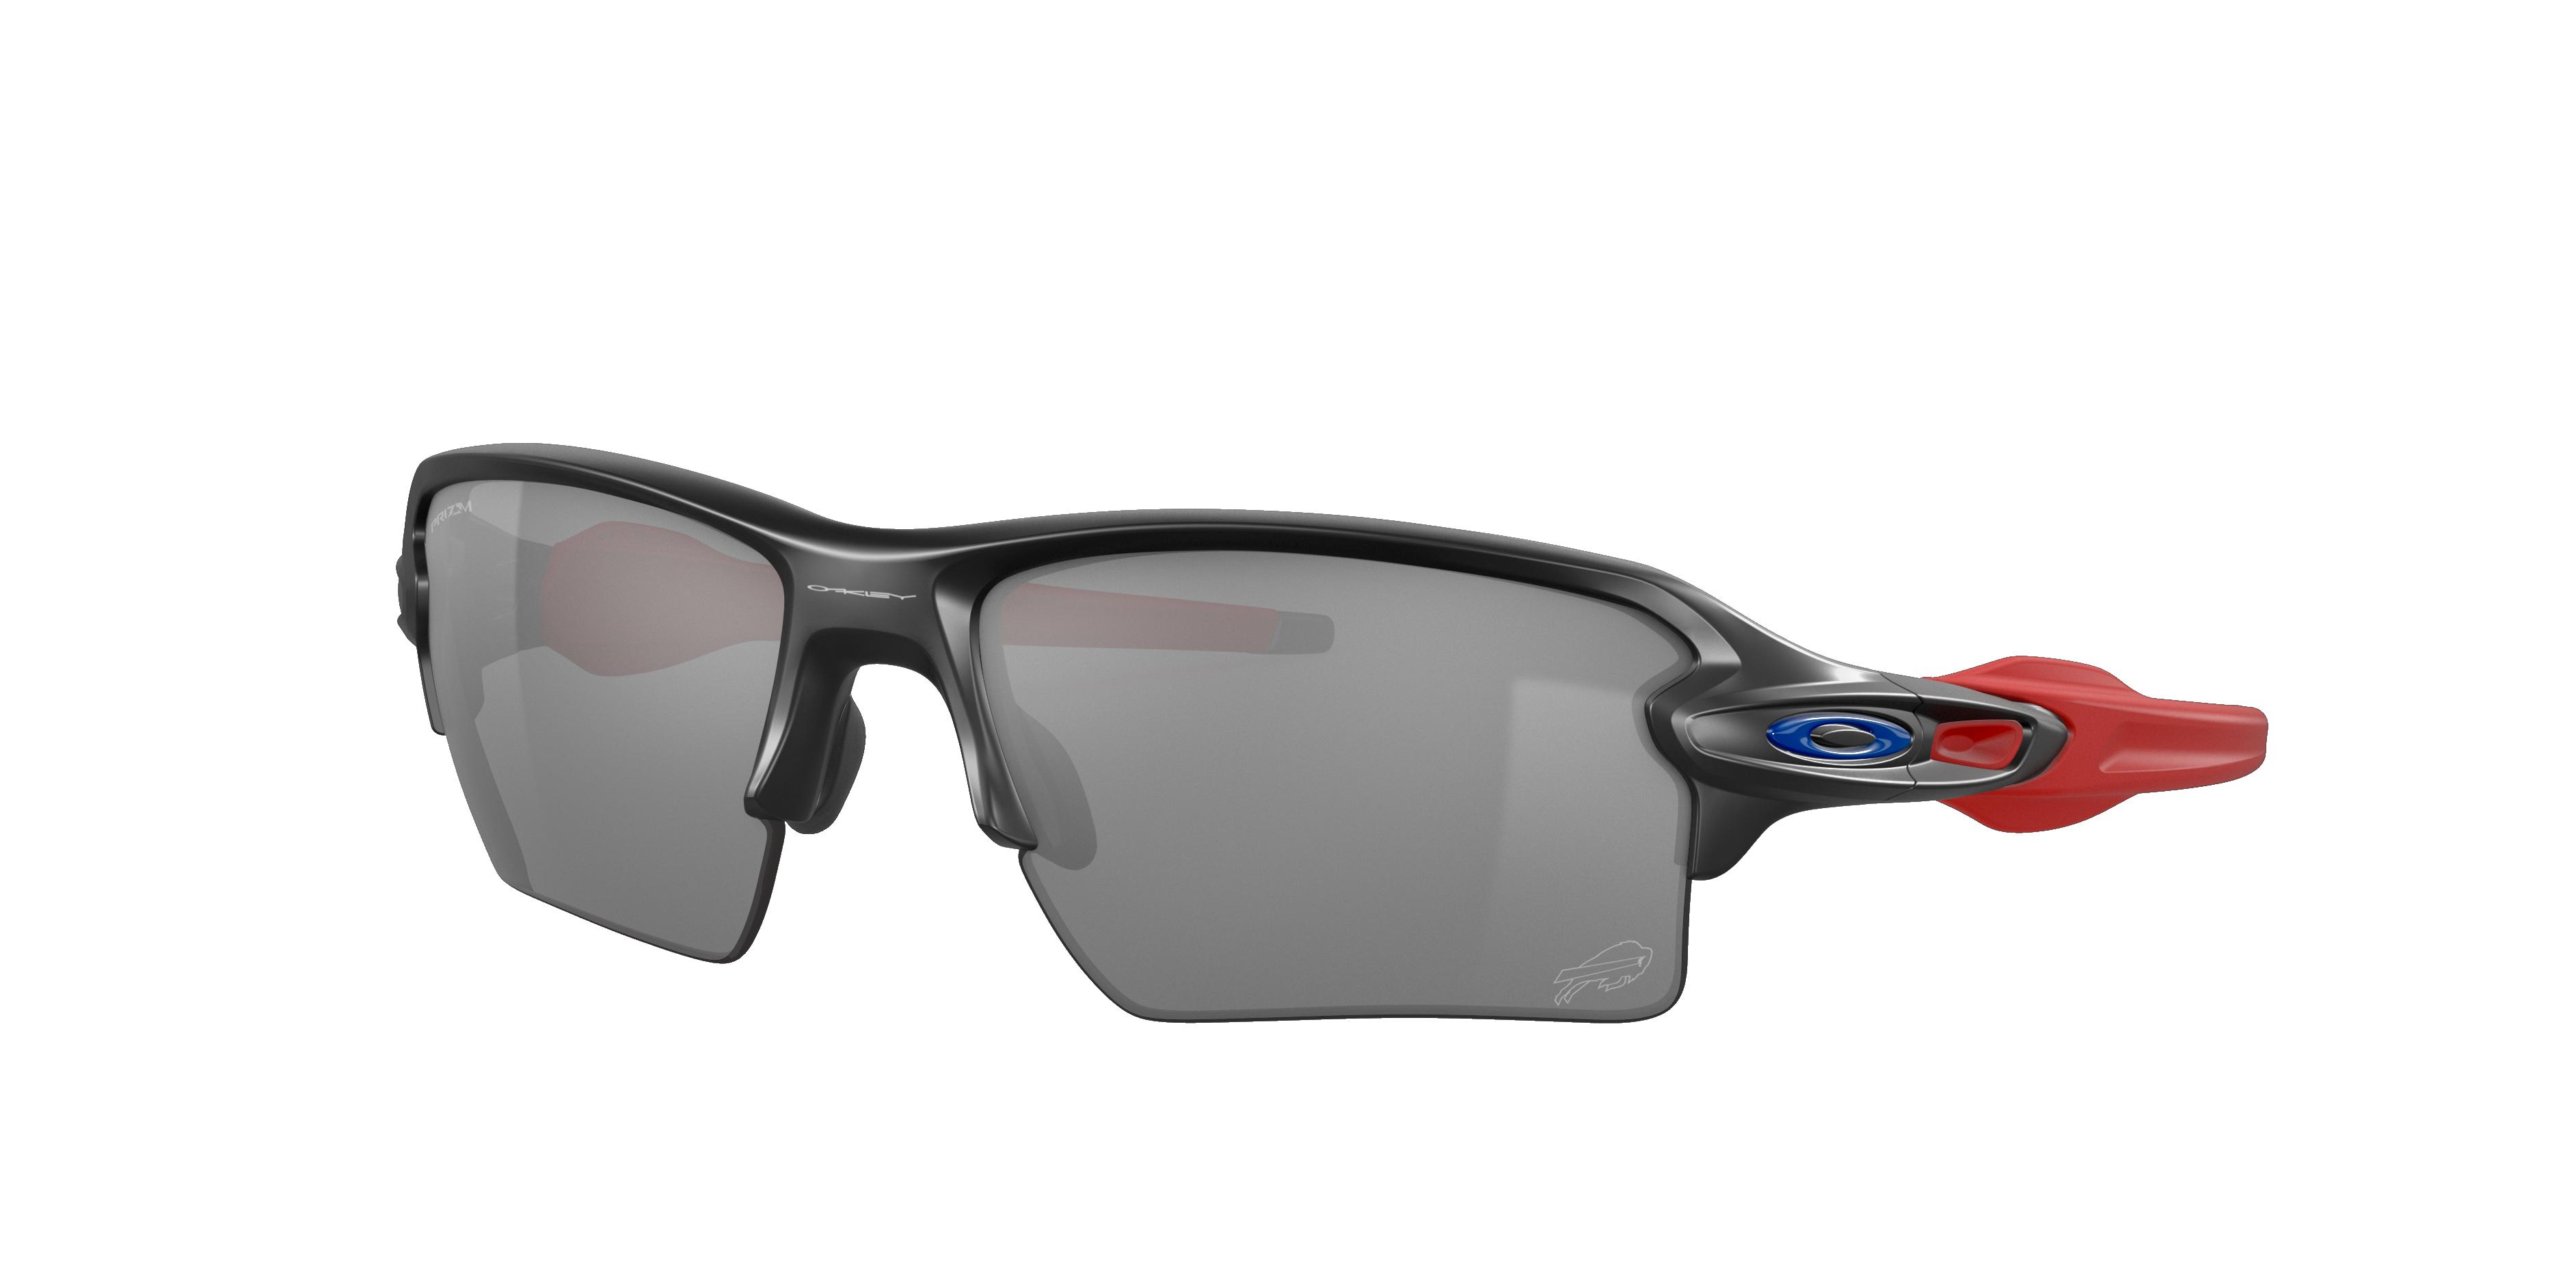 Uvex ski Take Off 84 21 Noir Blanc Ovale Lunettes de soleil Sunglasses NEUF